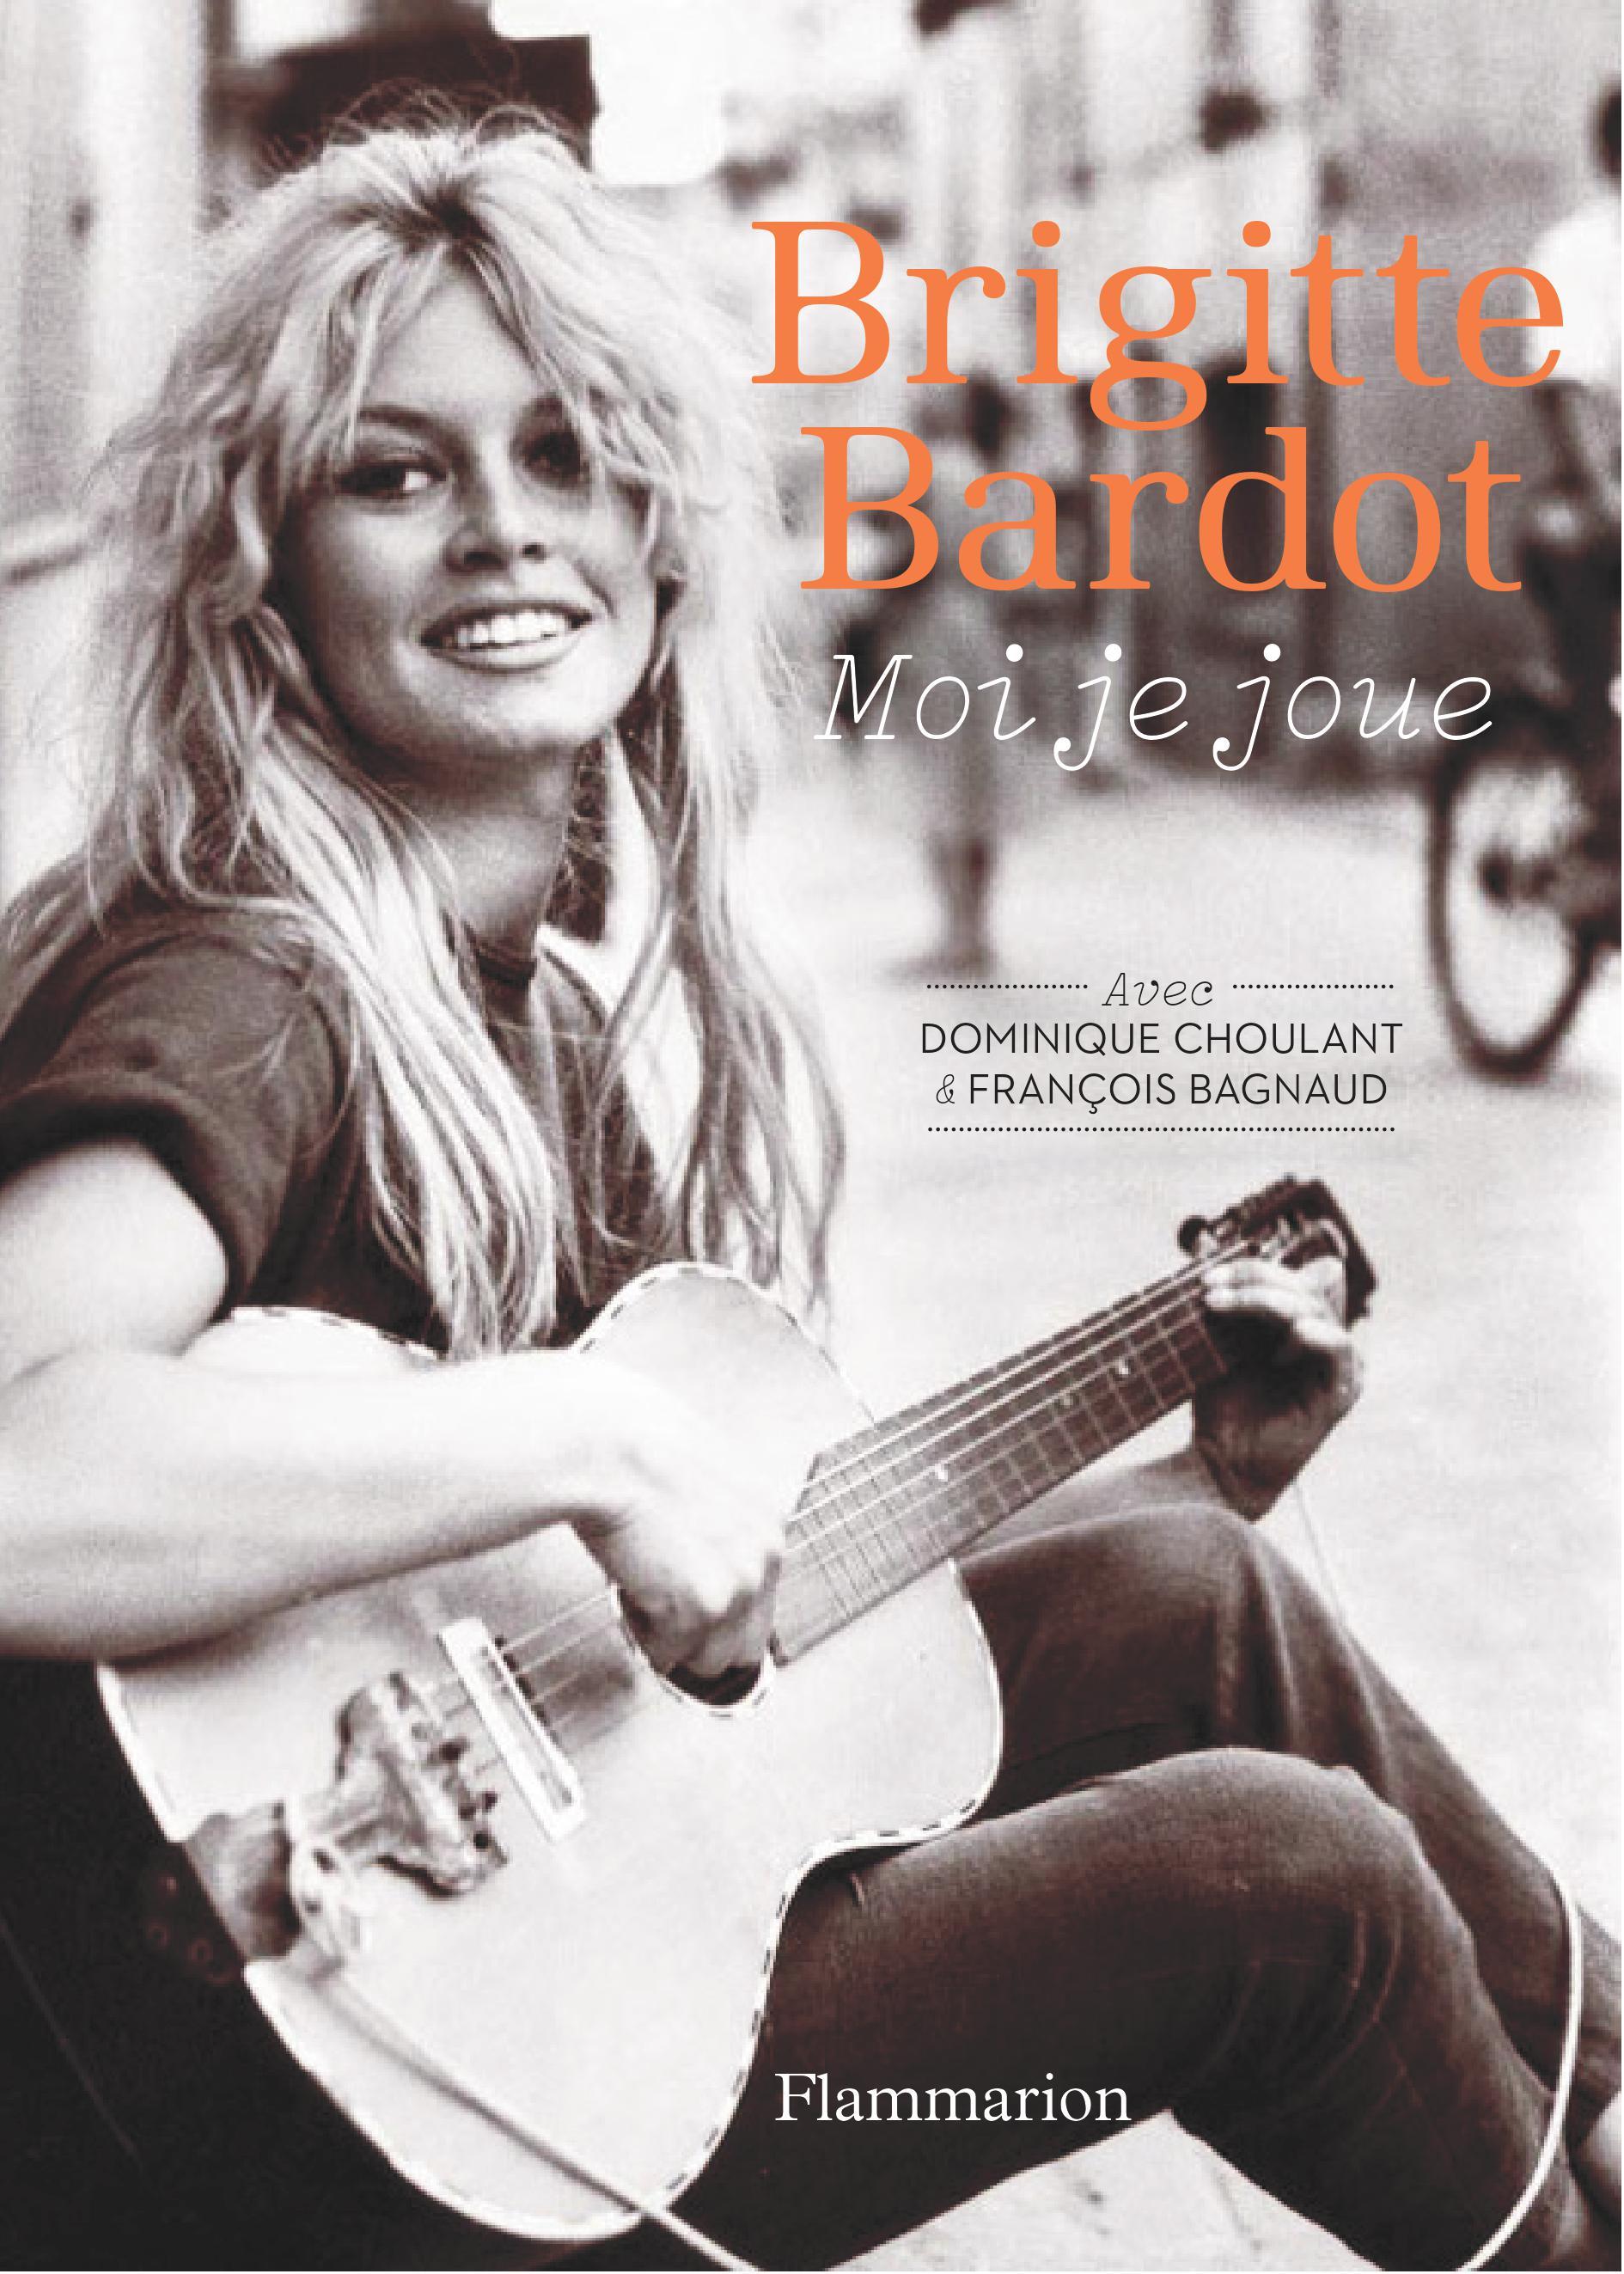 Brigitte Bardot Moi Je Joue : brigitte, bardot, Brigitte, Bardot, Dominique, Choulant